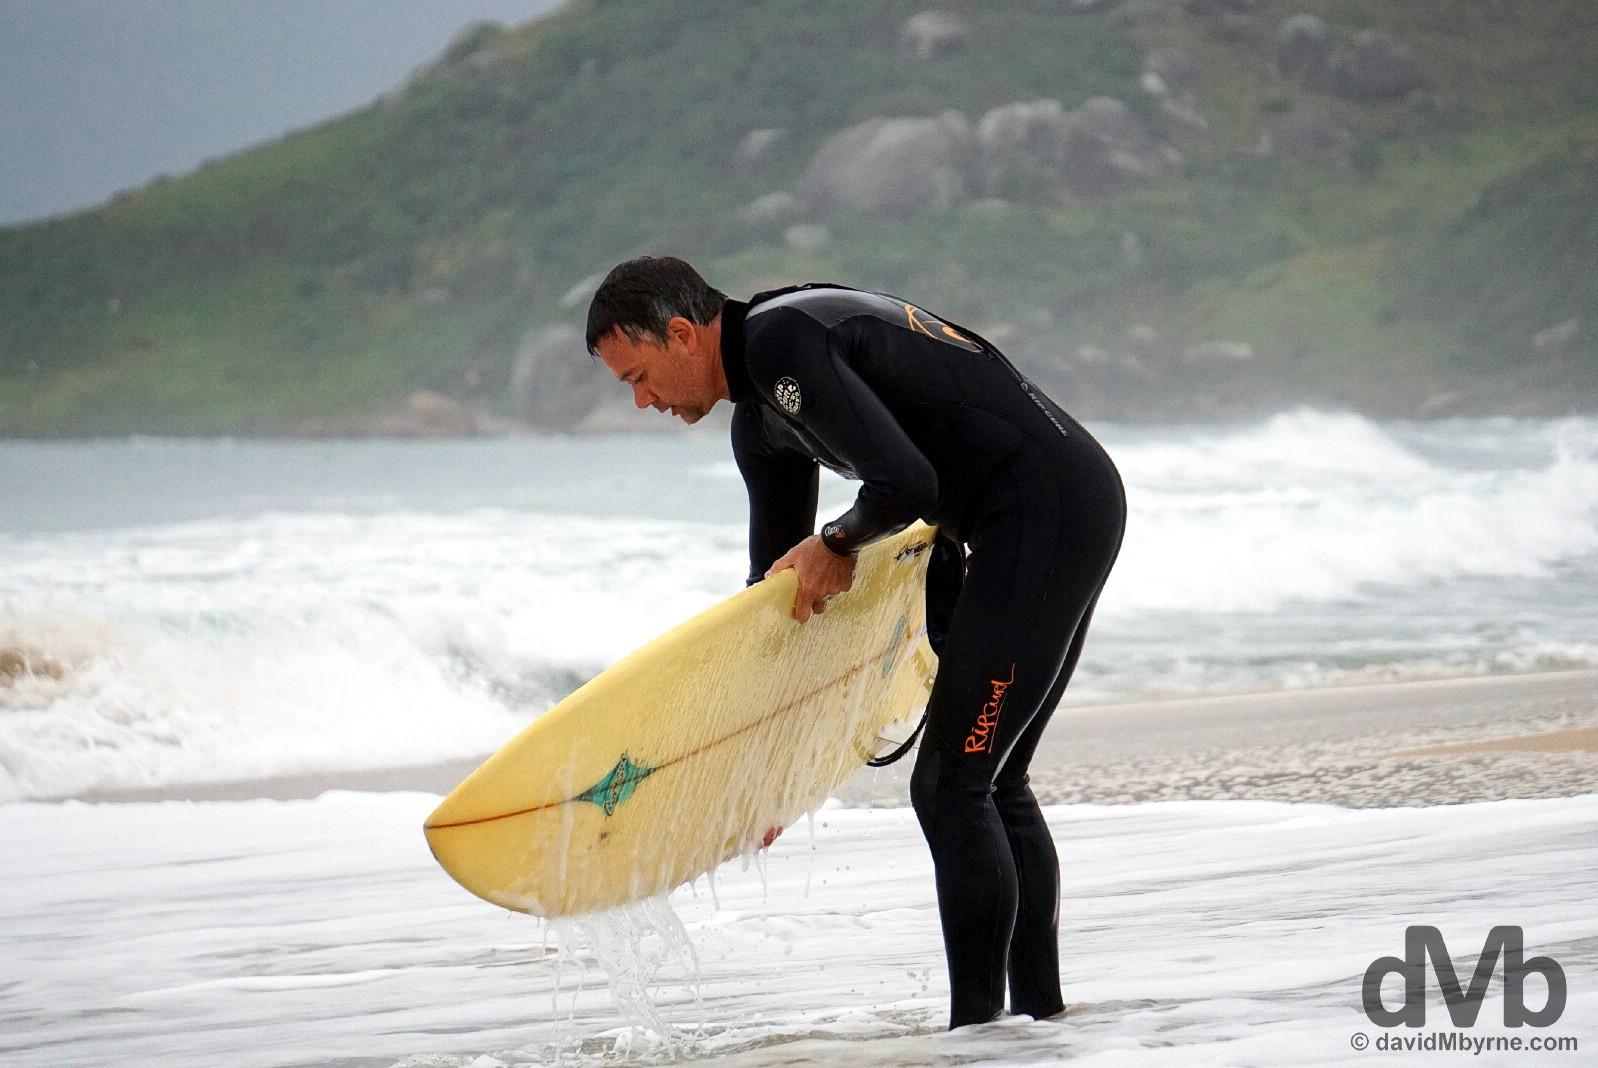 A surfer on Praia Mole on Ilah Santa Catarina, Brazil. September 17, 2015.